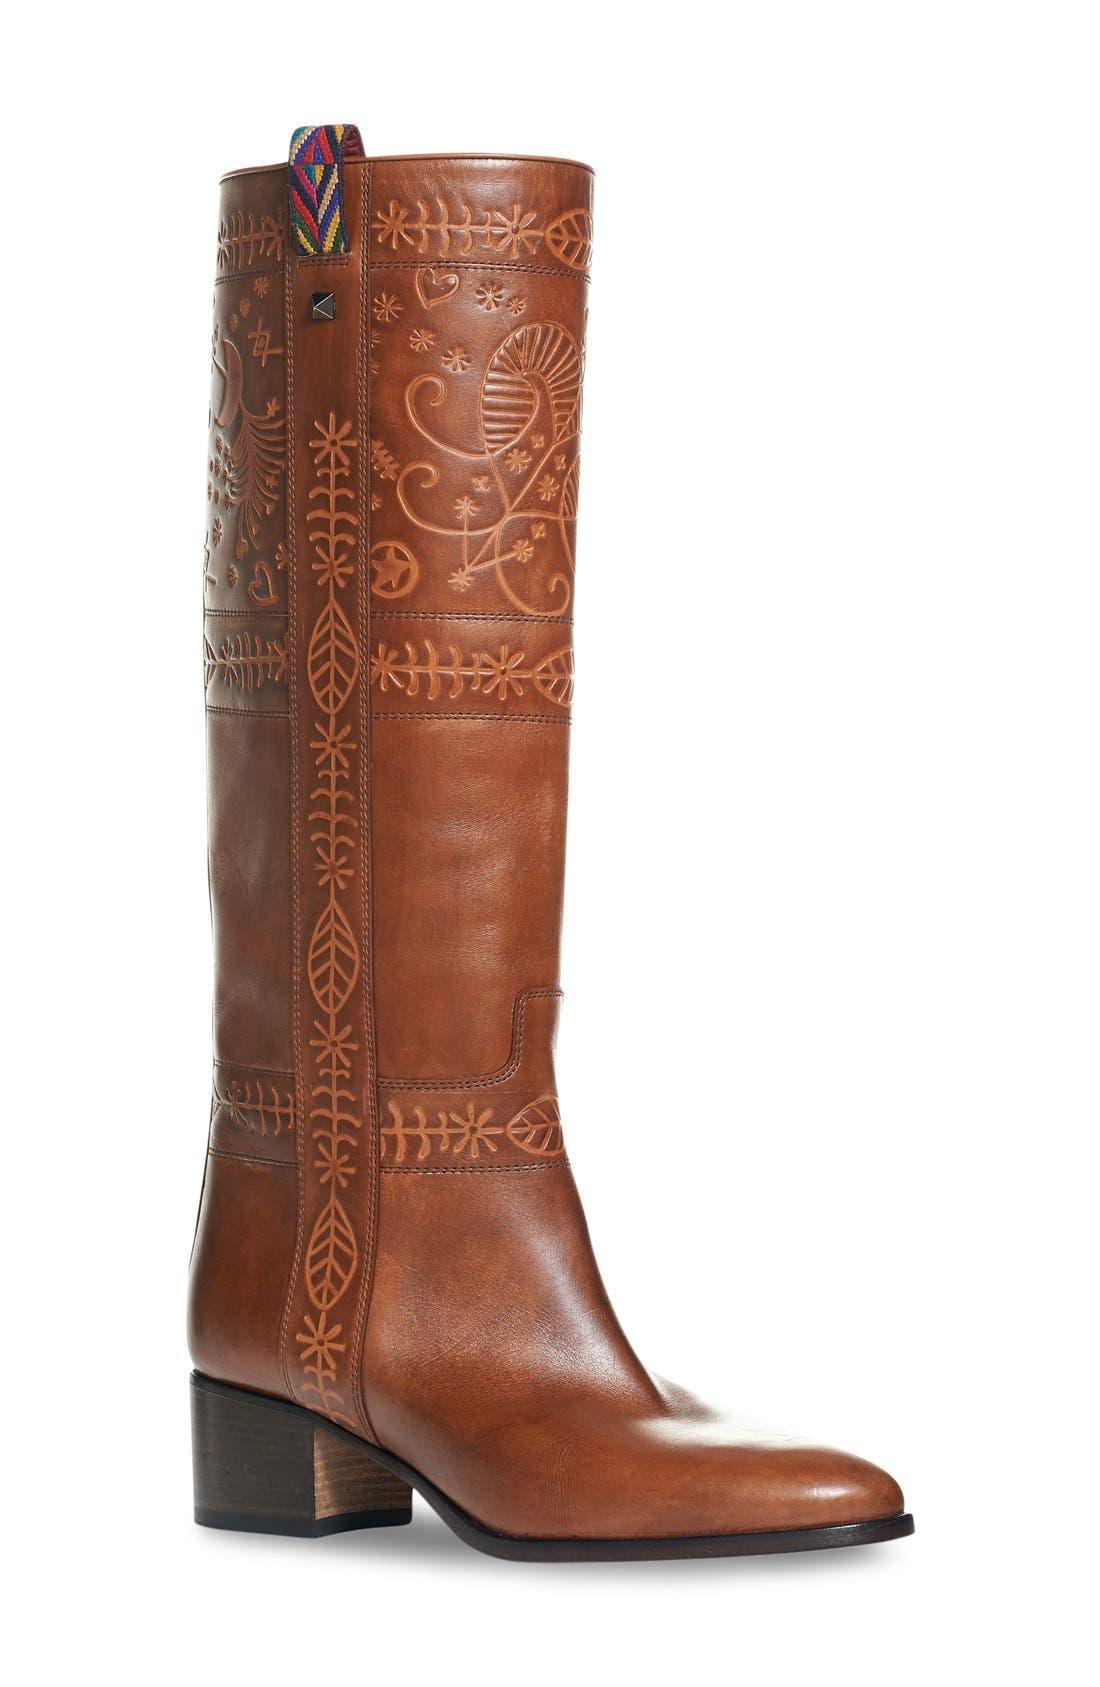 Alternate Image 1 Selected - Valentino 'Rockstud' Embossed Boot (Women)